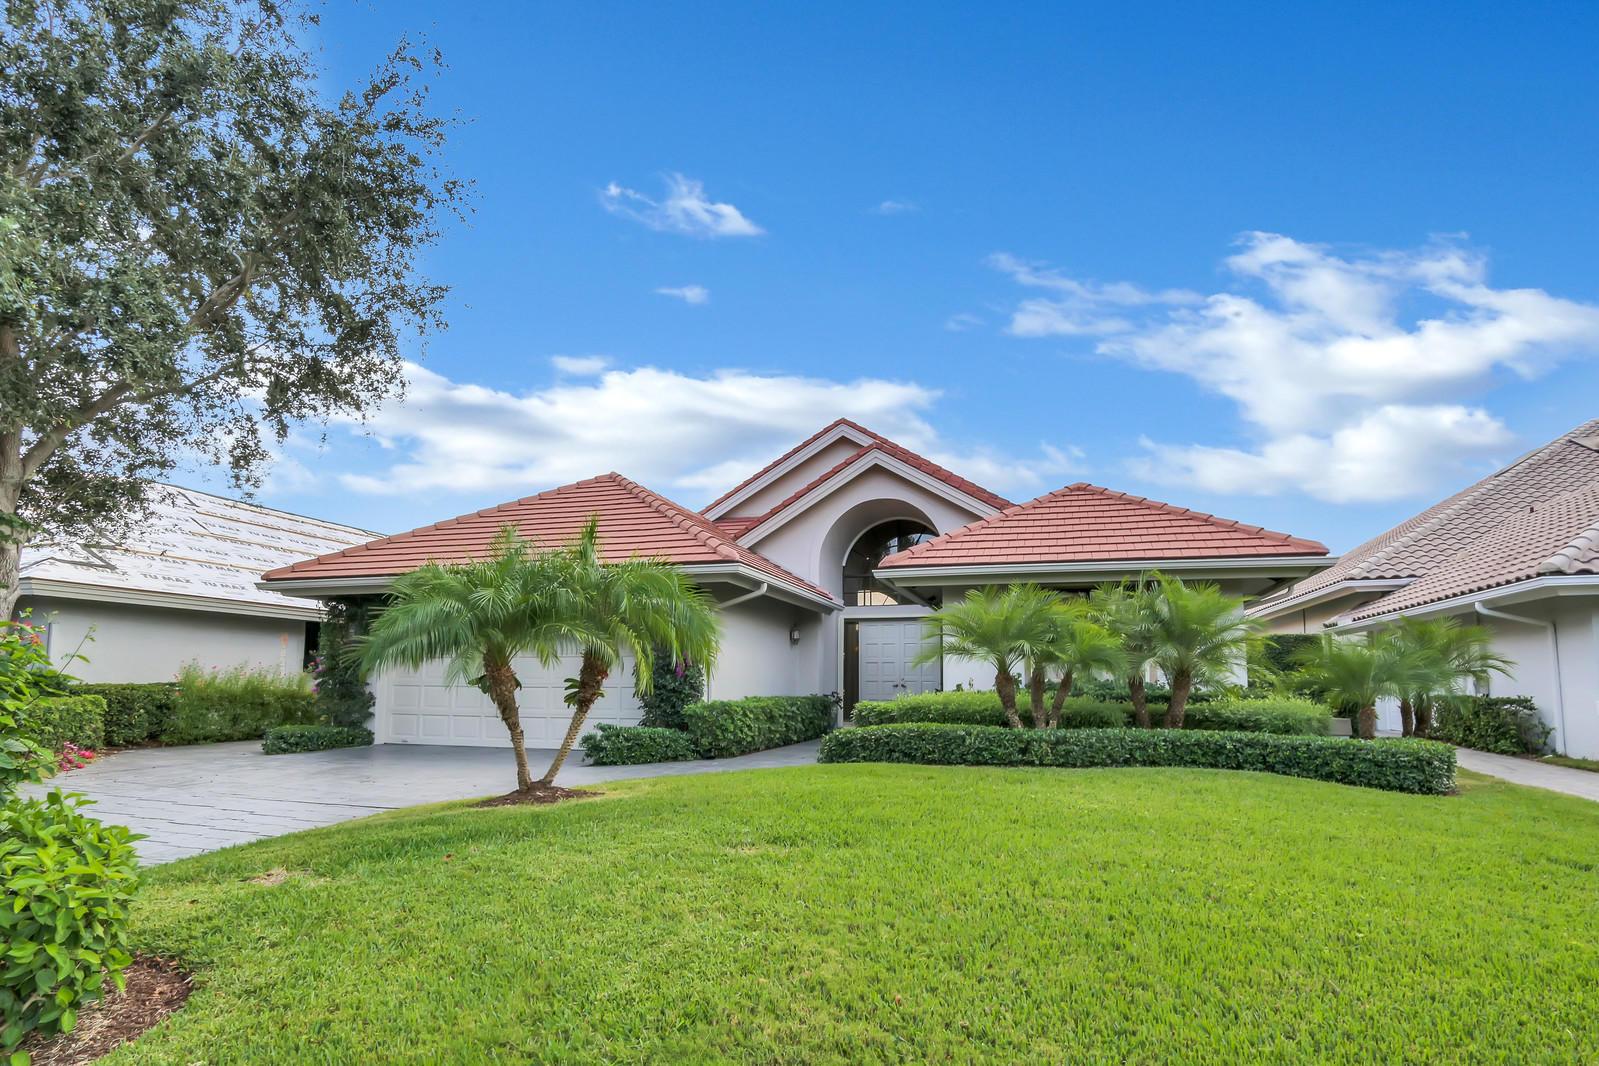 13645 Rivoli Drive, Palm Beach Gardens, Florida 33410, 2 Bedrooms Bedrooms, ,3 BathroomsBathrooms,A,Single family,Rivoli,RX-10481674